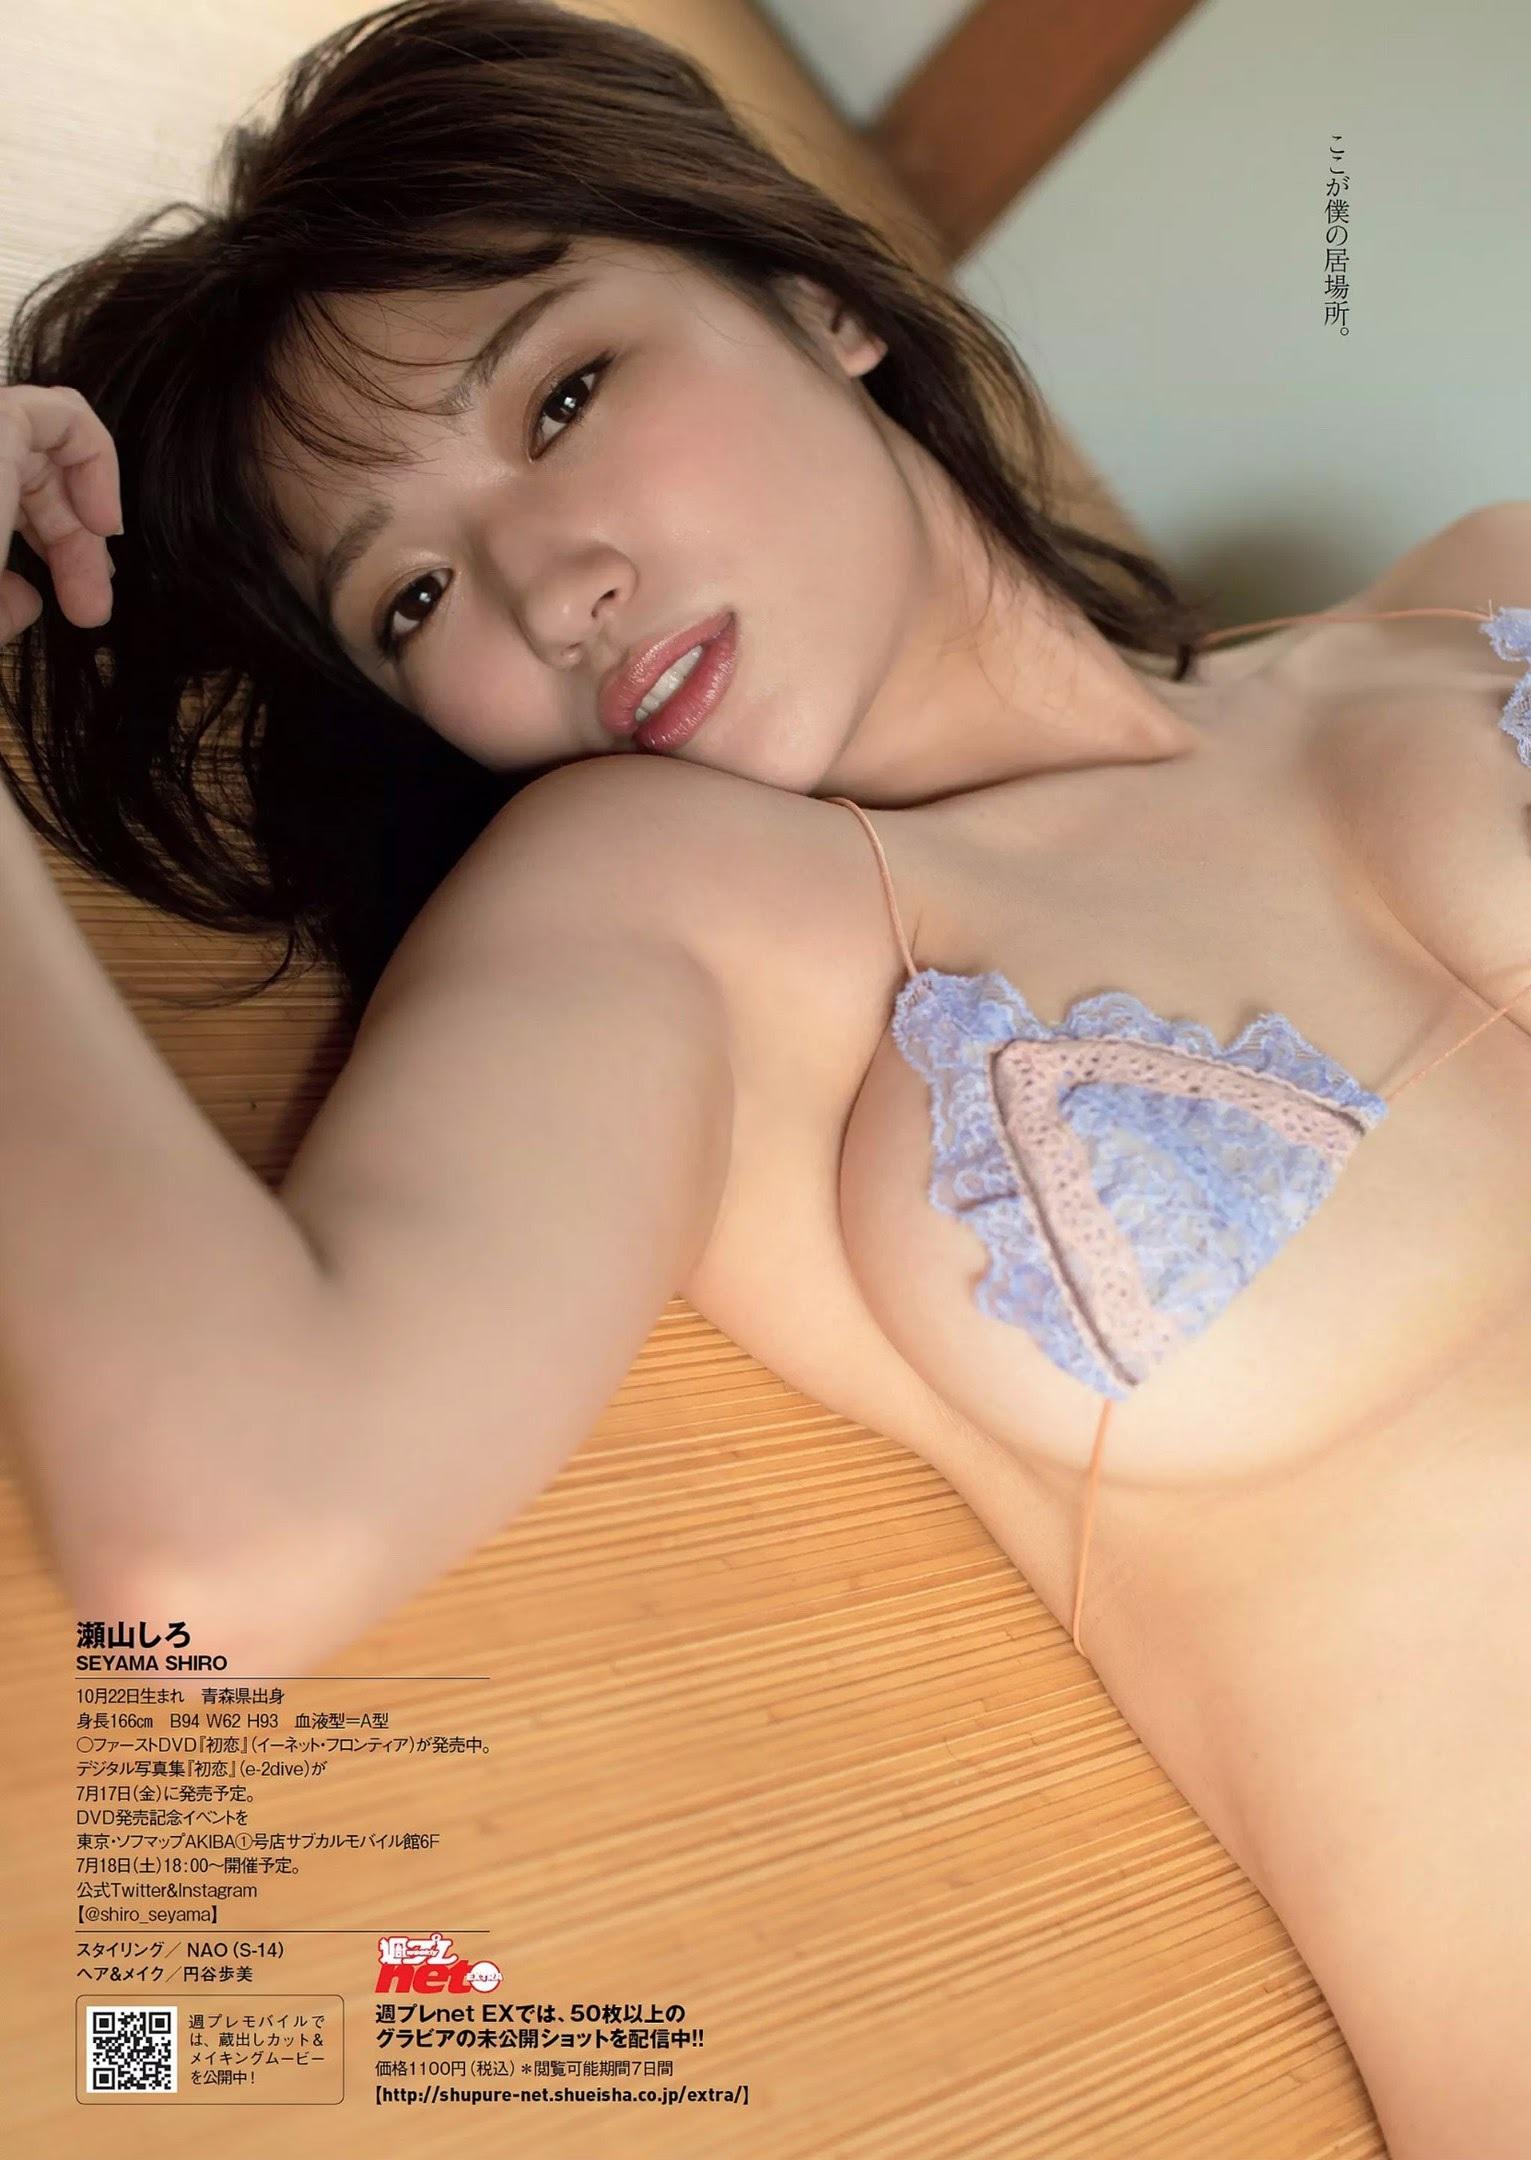 Former nurse with bigtits, slender and idolloving beauty Shiro Seyama Swimsuit Gravure 2020004